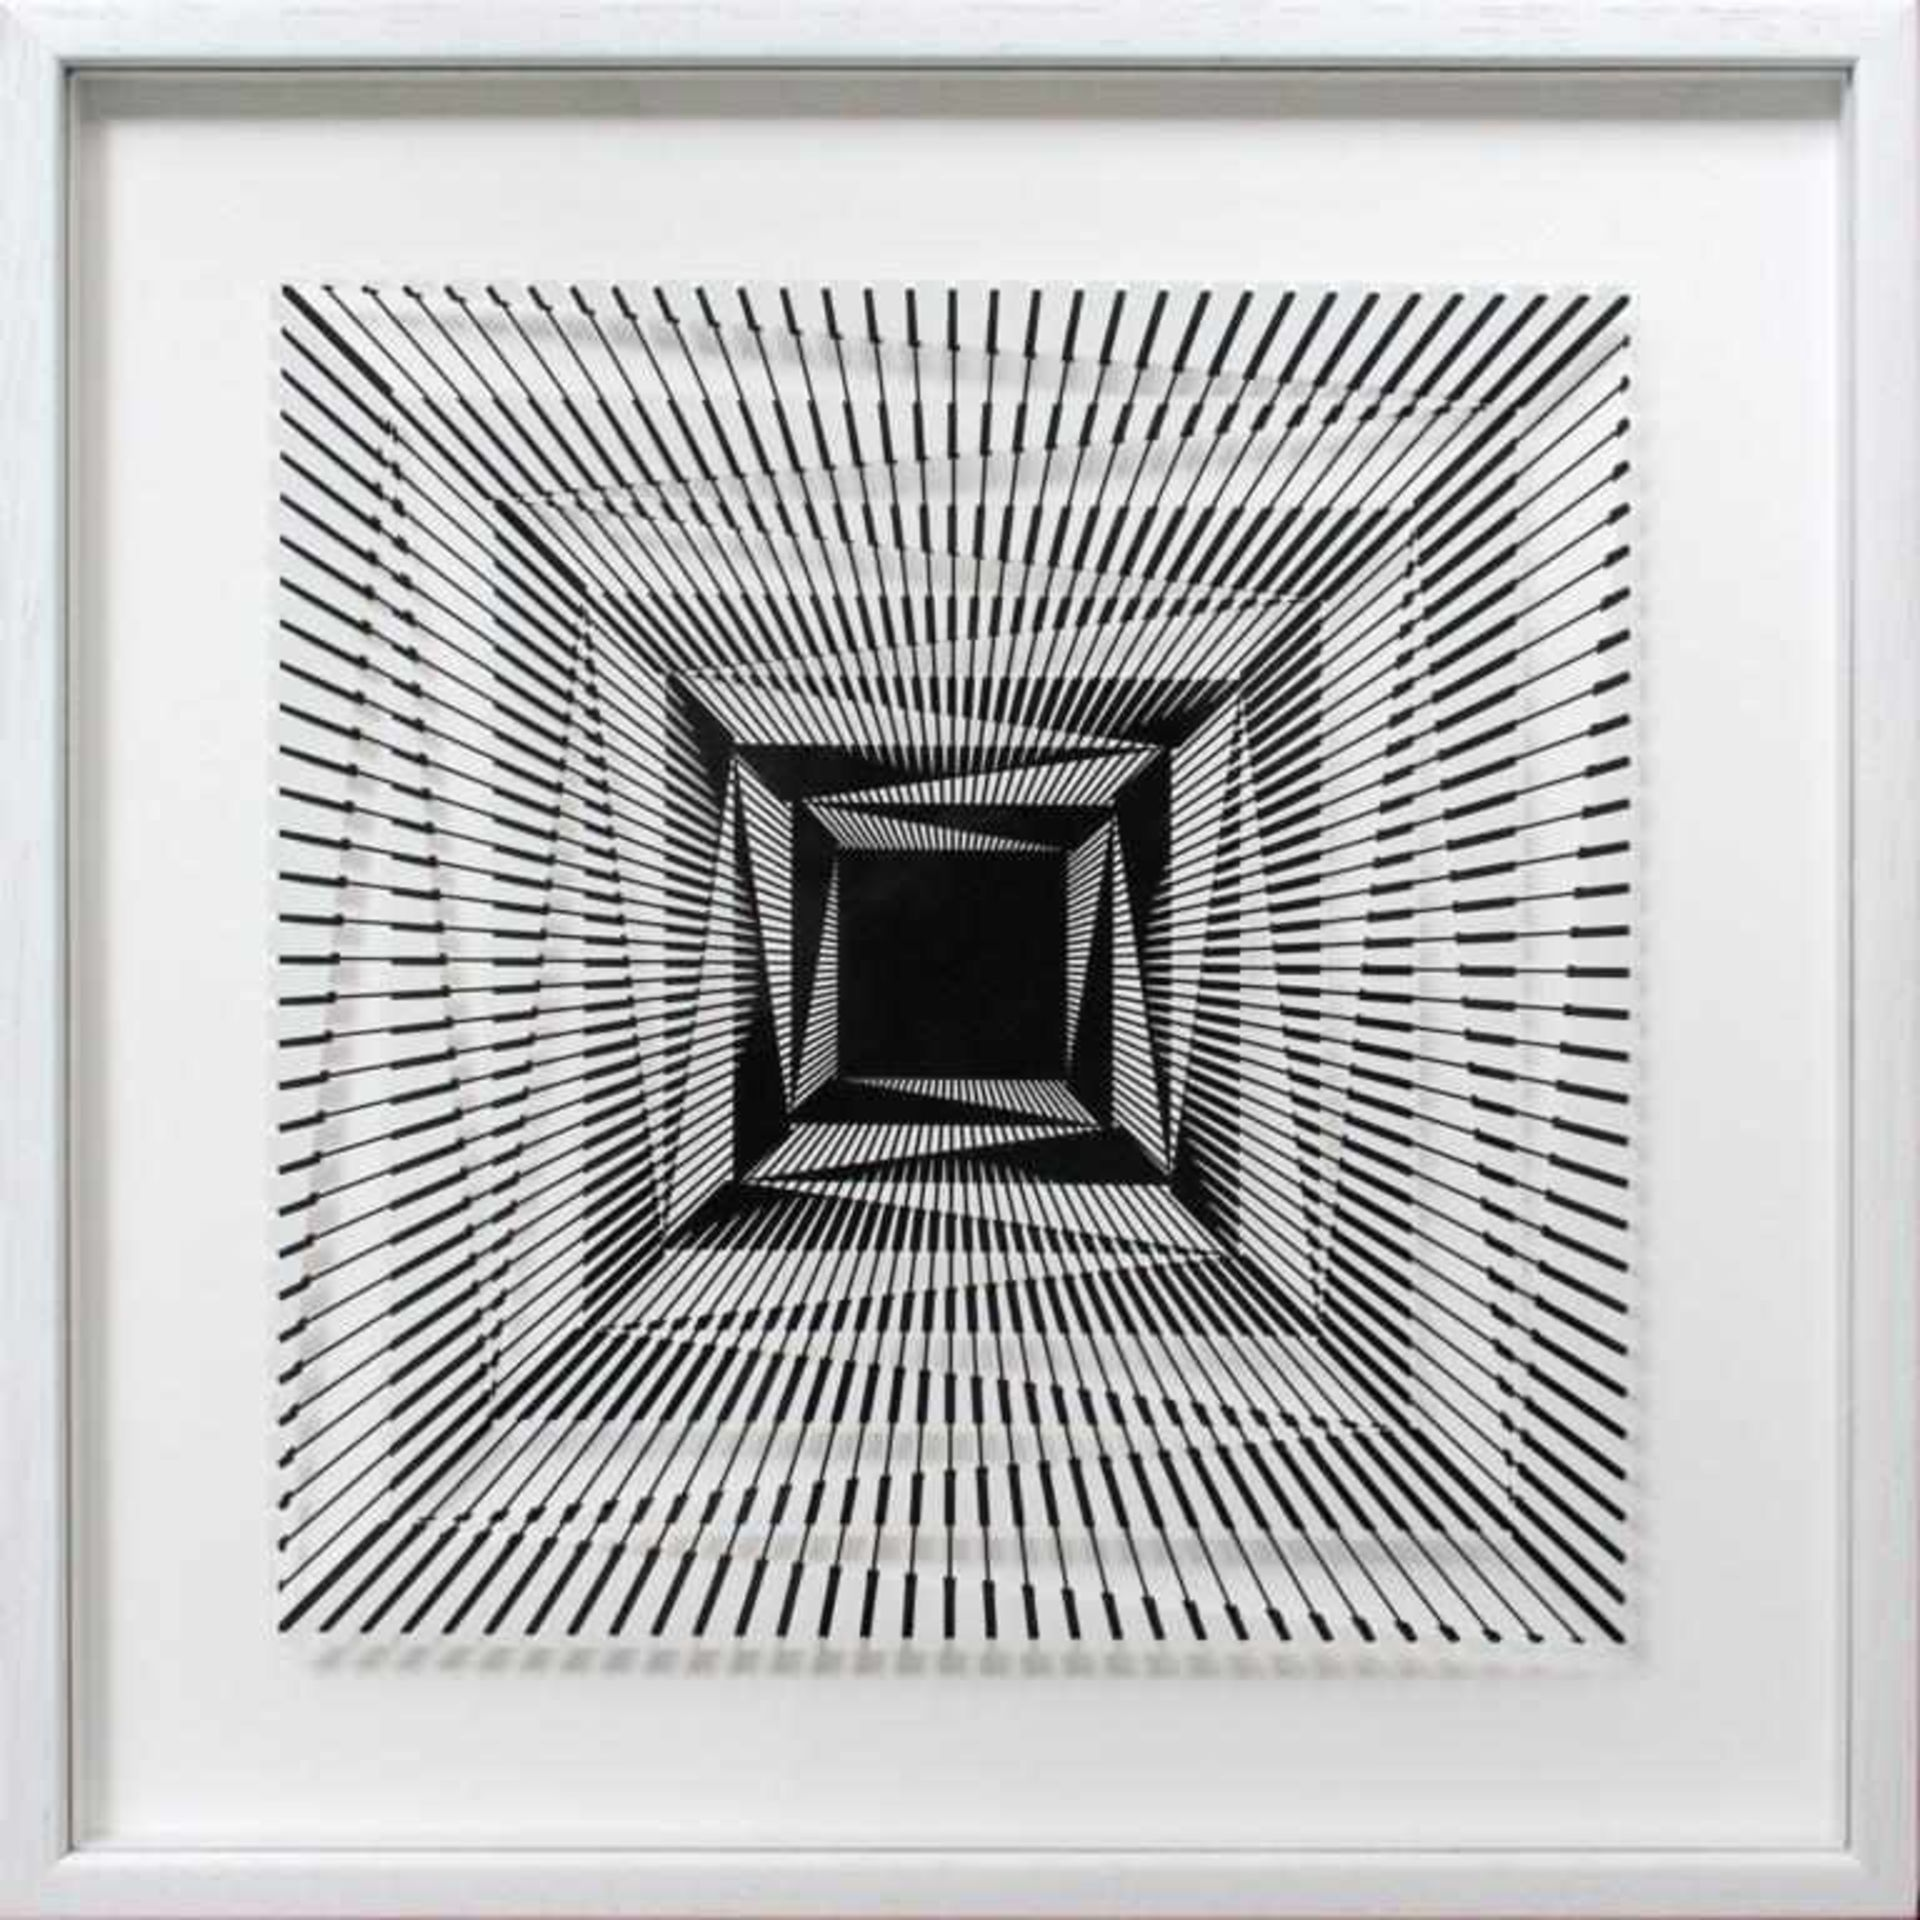 Los 13 - Morandini Marcello (geb. 1940) Komposition 655b 2017 3D Konstruktion aus Baumwollpapier und